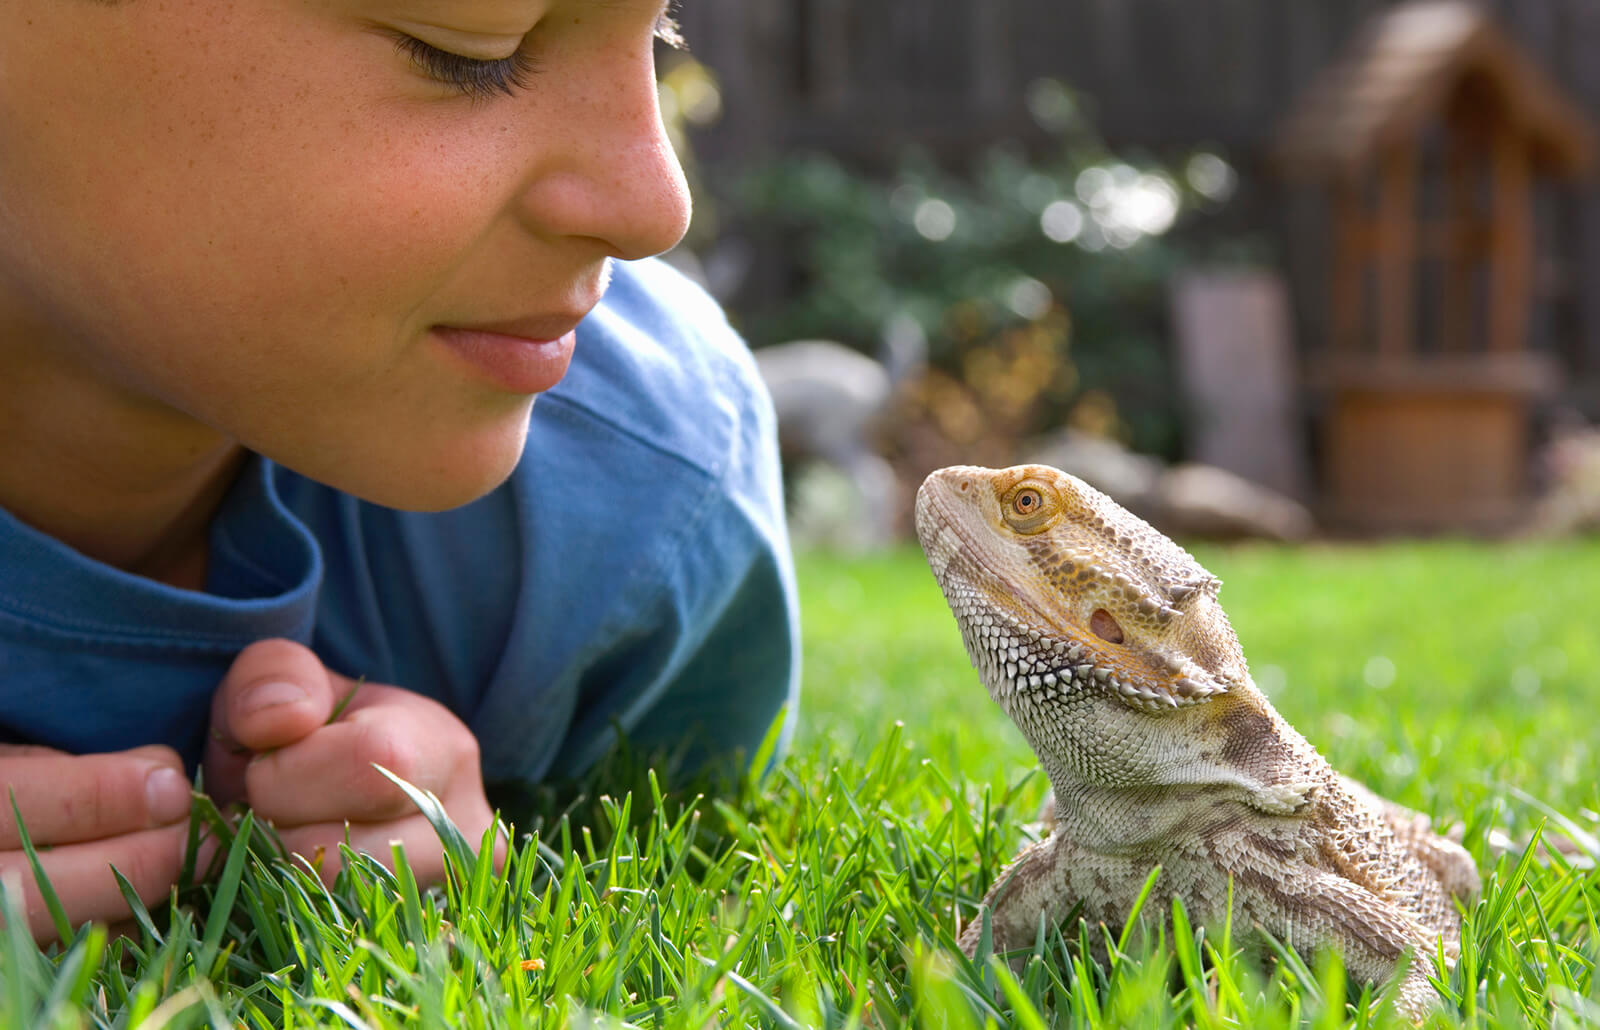 Names for Pet Reptiles | LoveToKnow